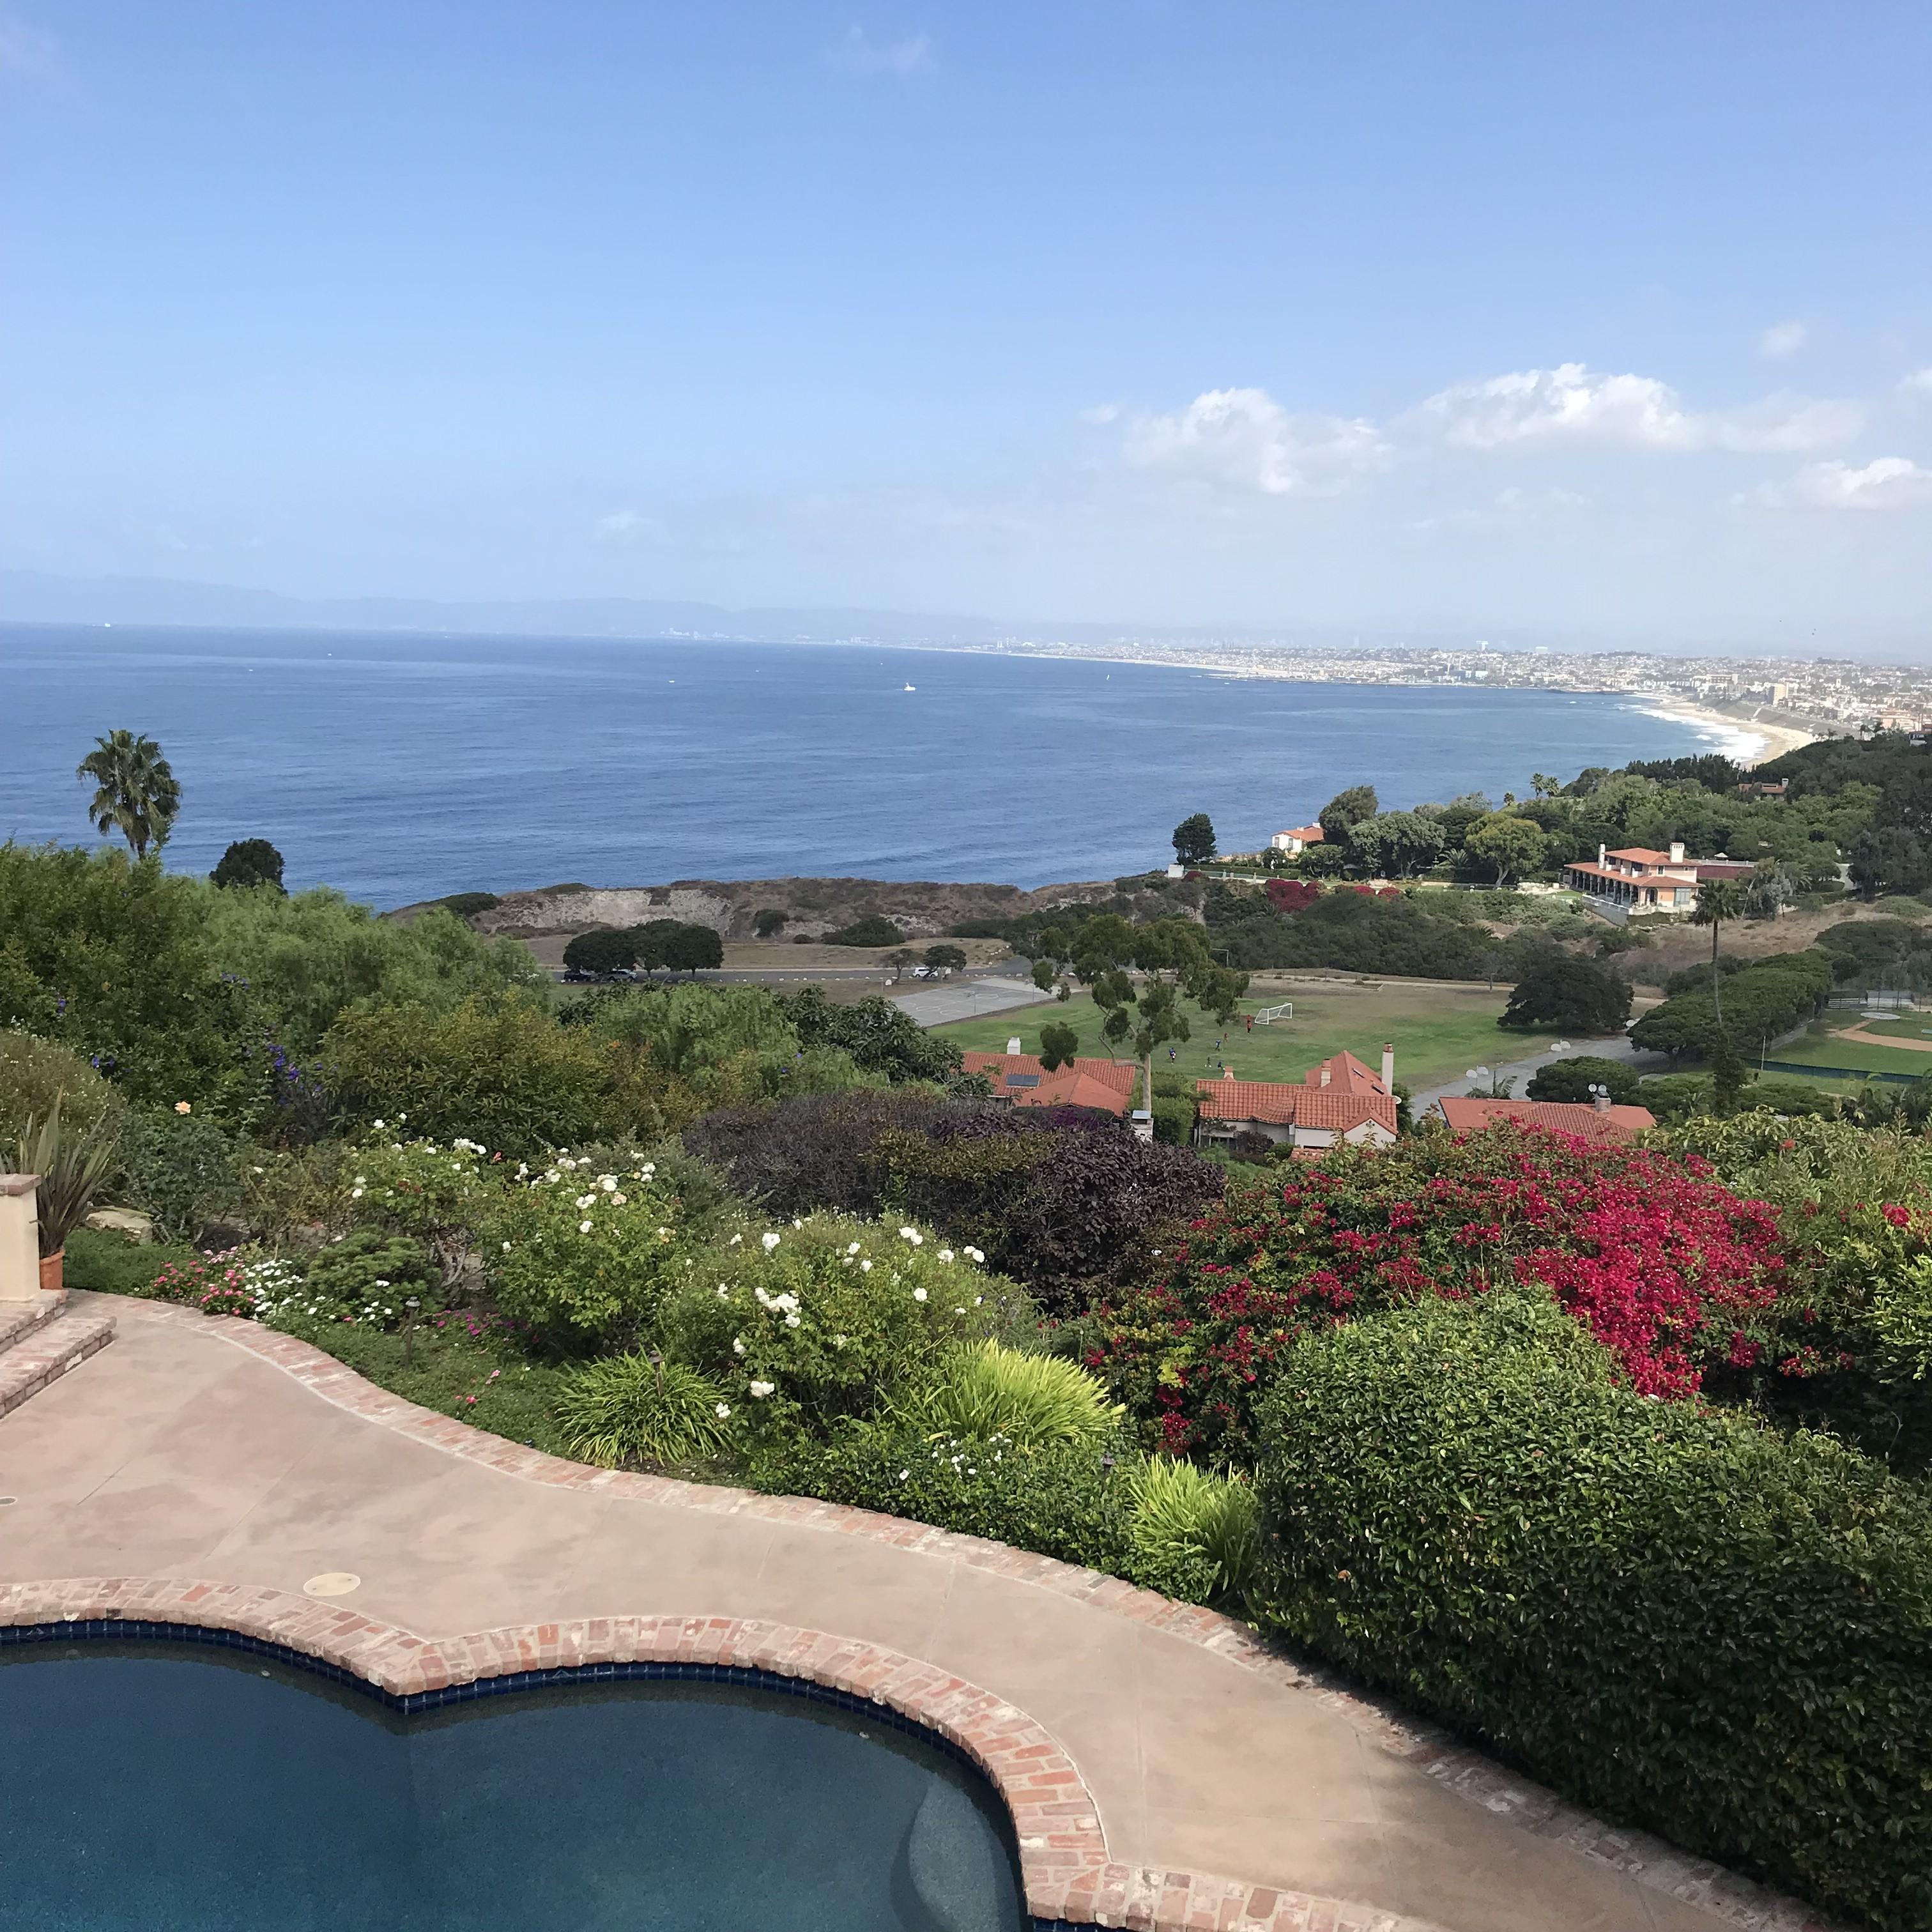 The Pandemic Effect on the Palos Verdes Housing Market